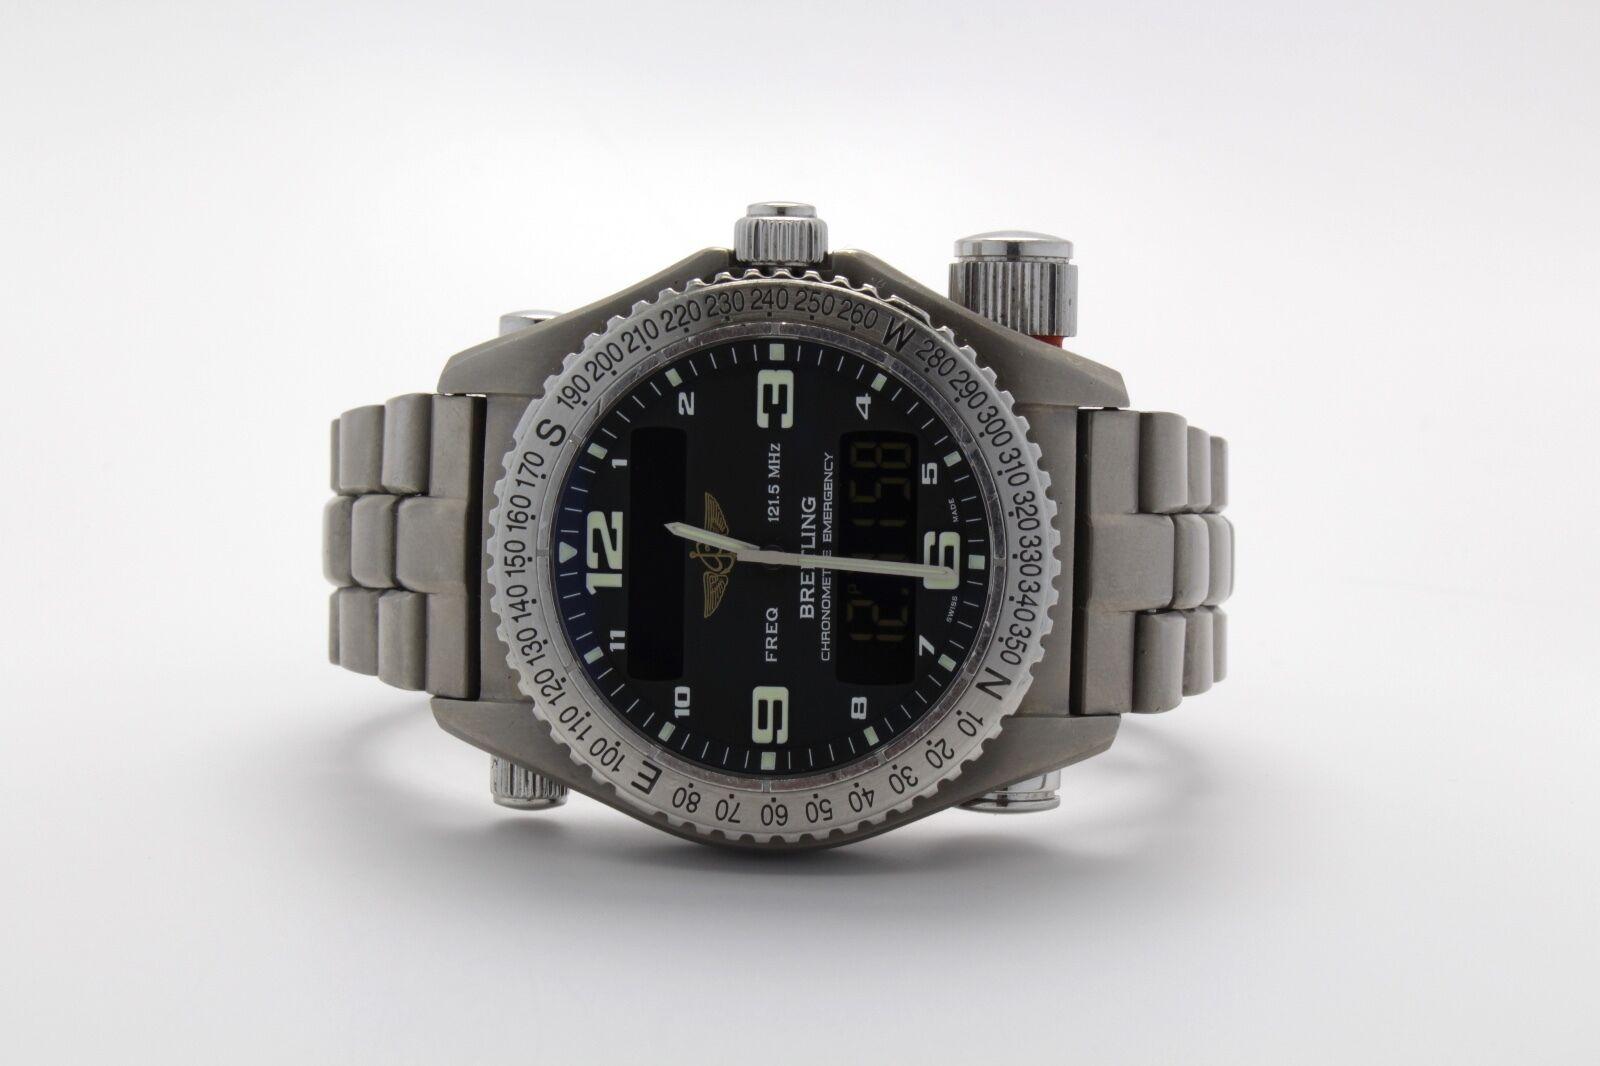 $4695.00 - Breitling Professional Emergency Titanium Black Dial E76321 43mm Superquartz